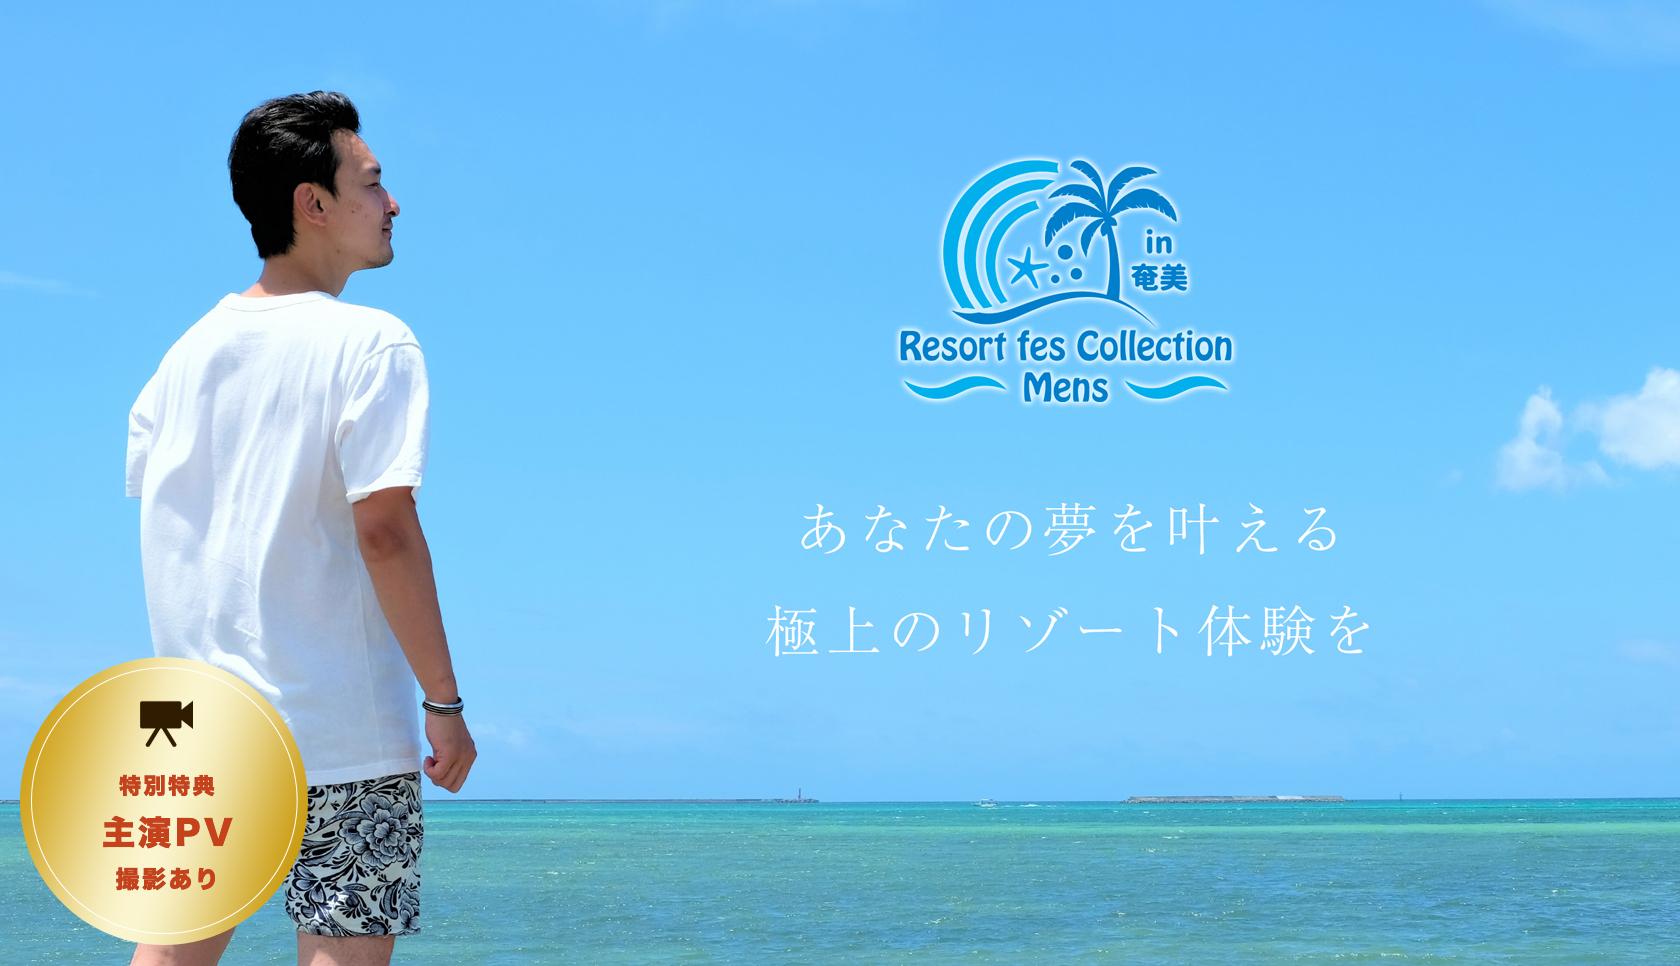 Resort fes Collection in奄美 -Mens-メイン画像